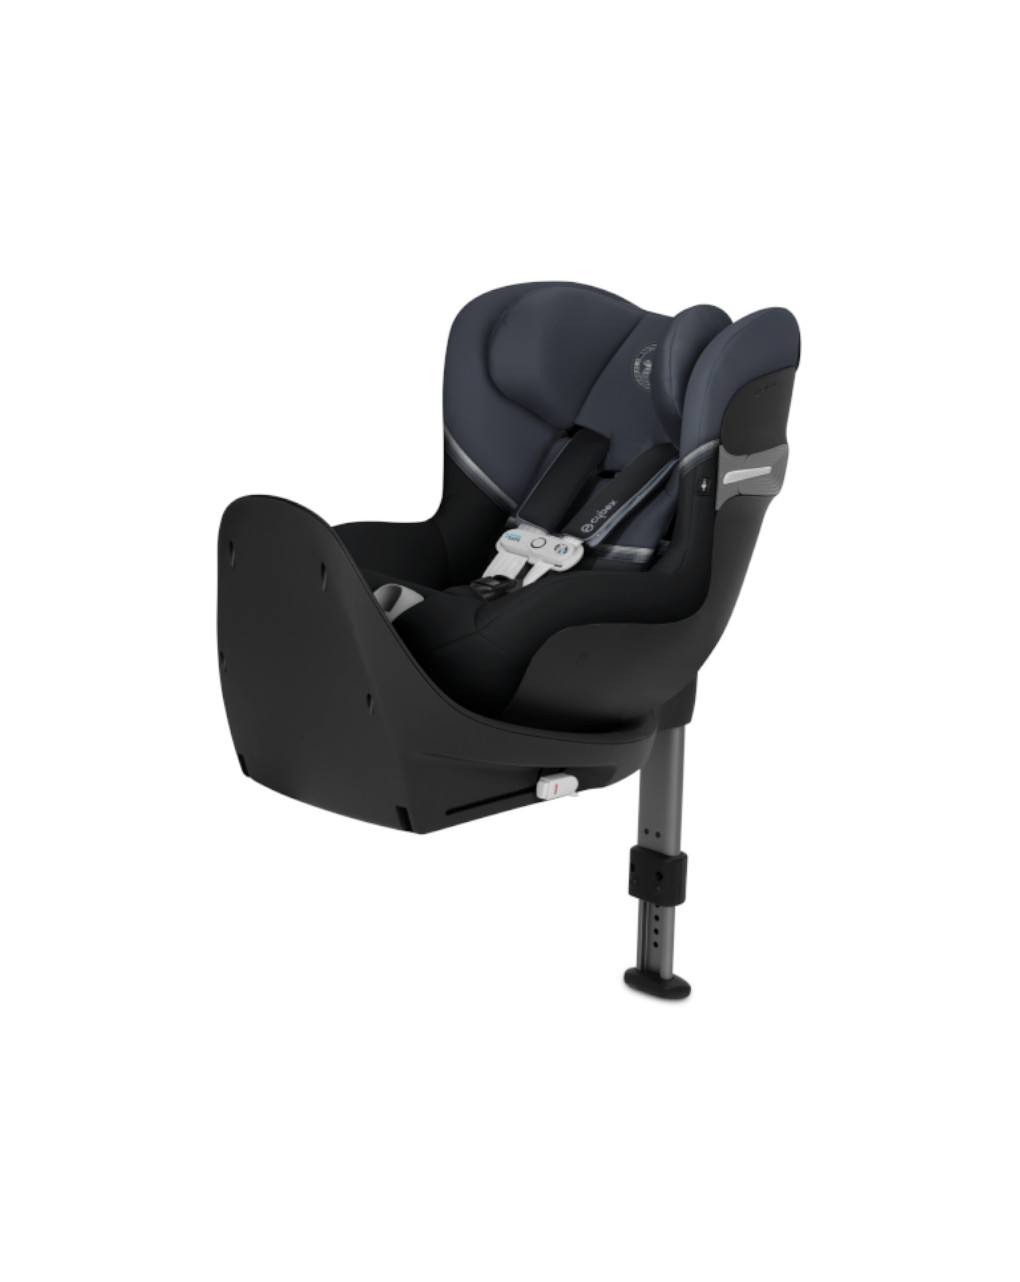 Cybex Κάθισμα Αυτοκινήτου Sirona S I-Size Granite Black